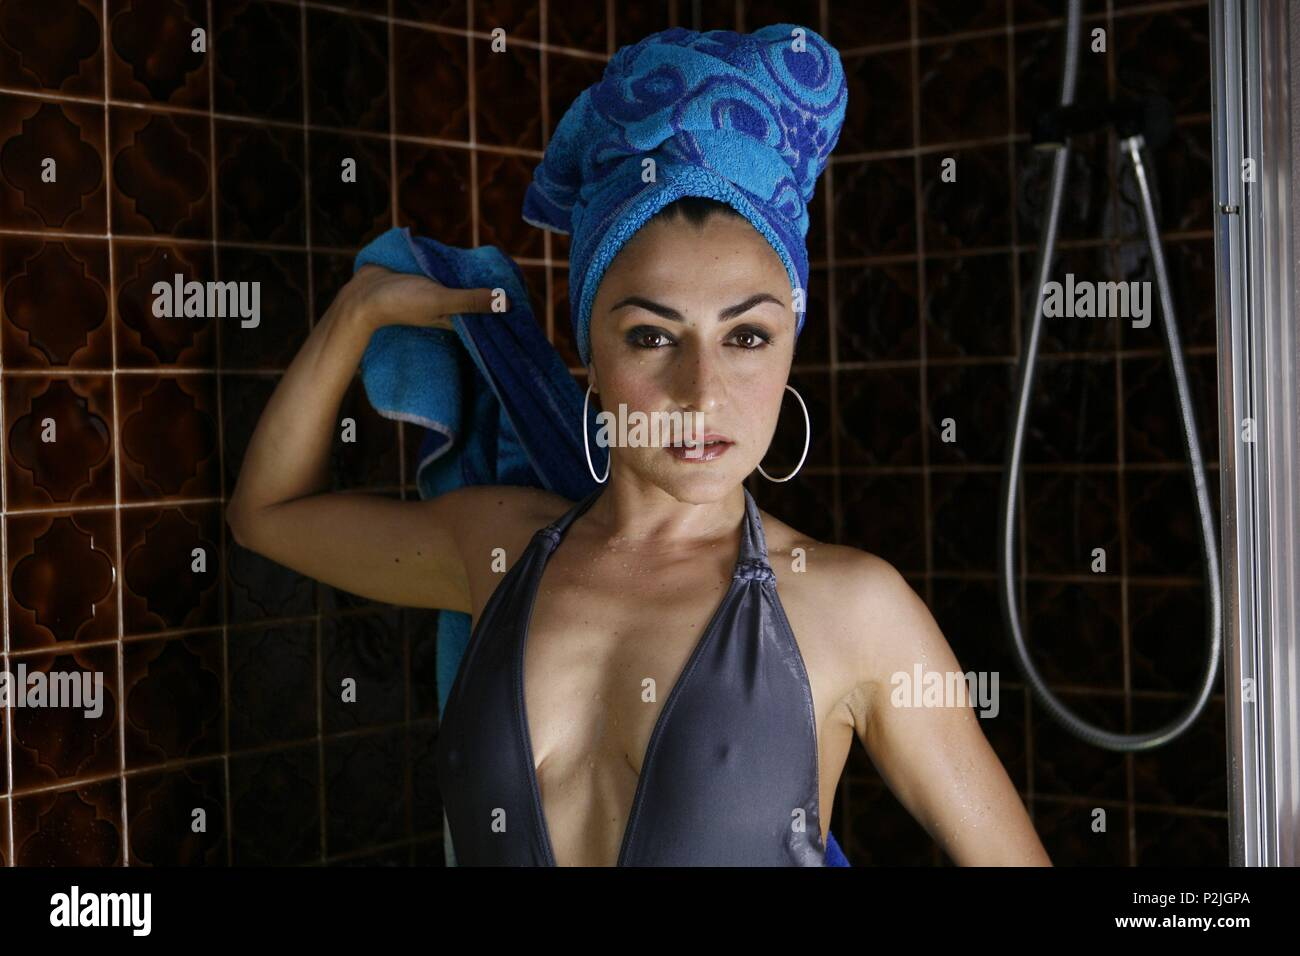 Foto candela pena desnuda Nude Photos 18